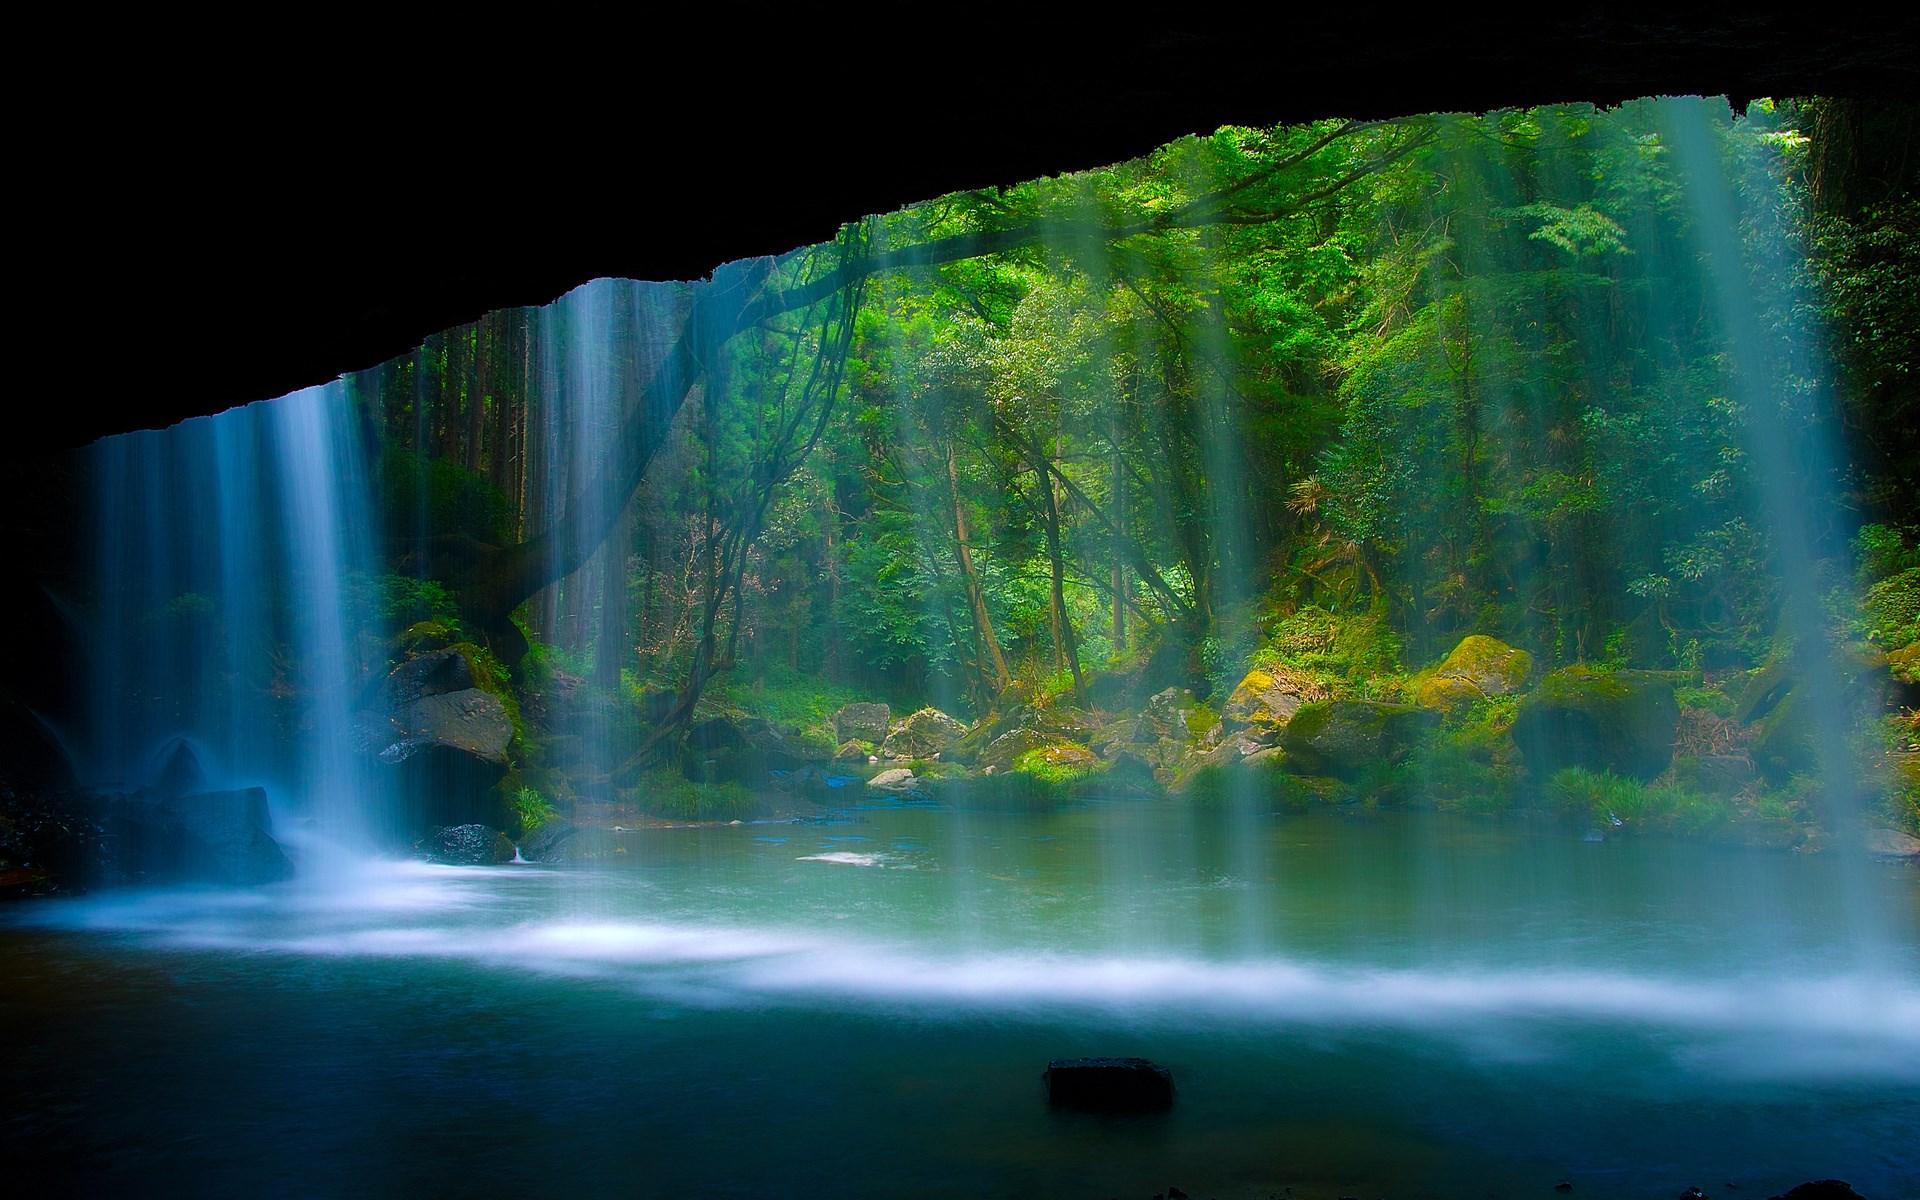 waterfall wallpaper download